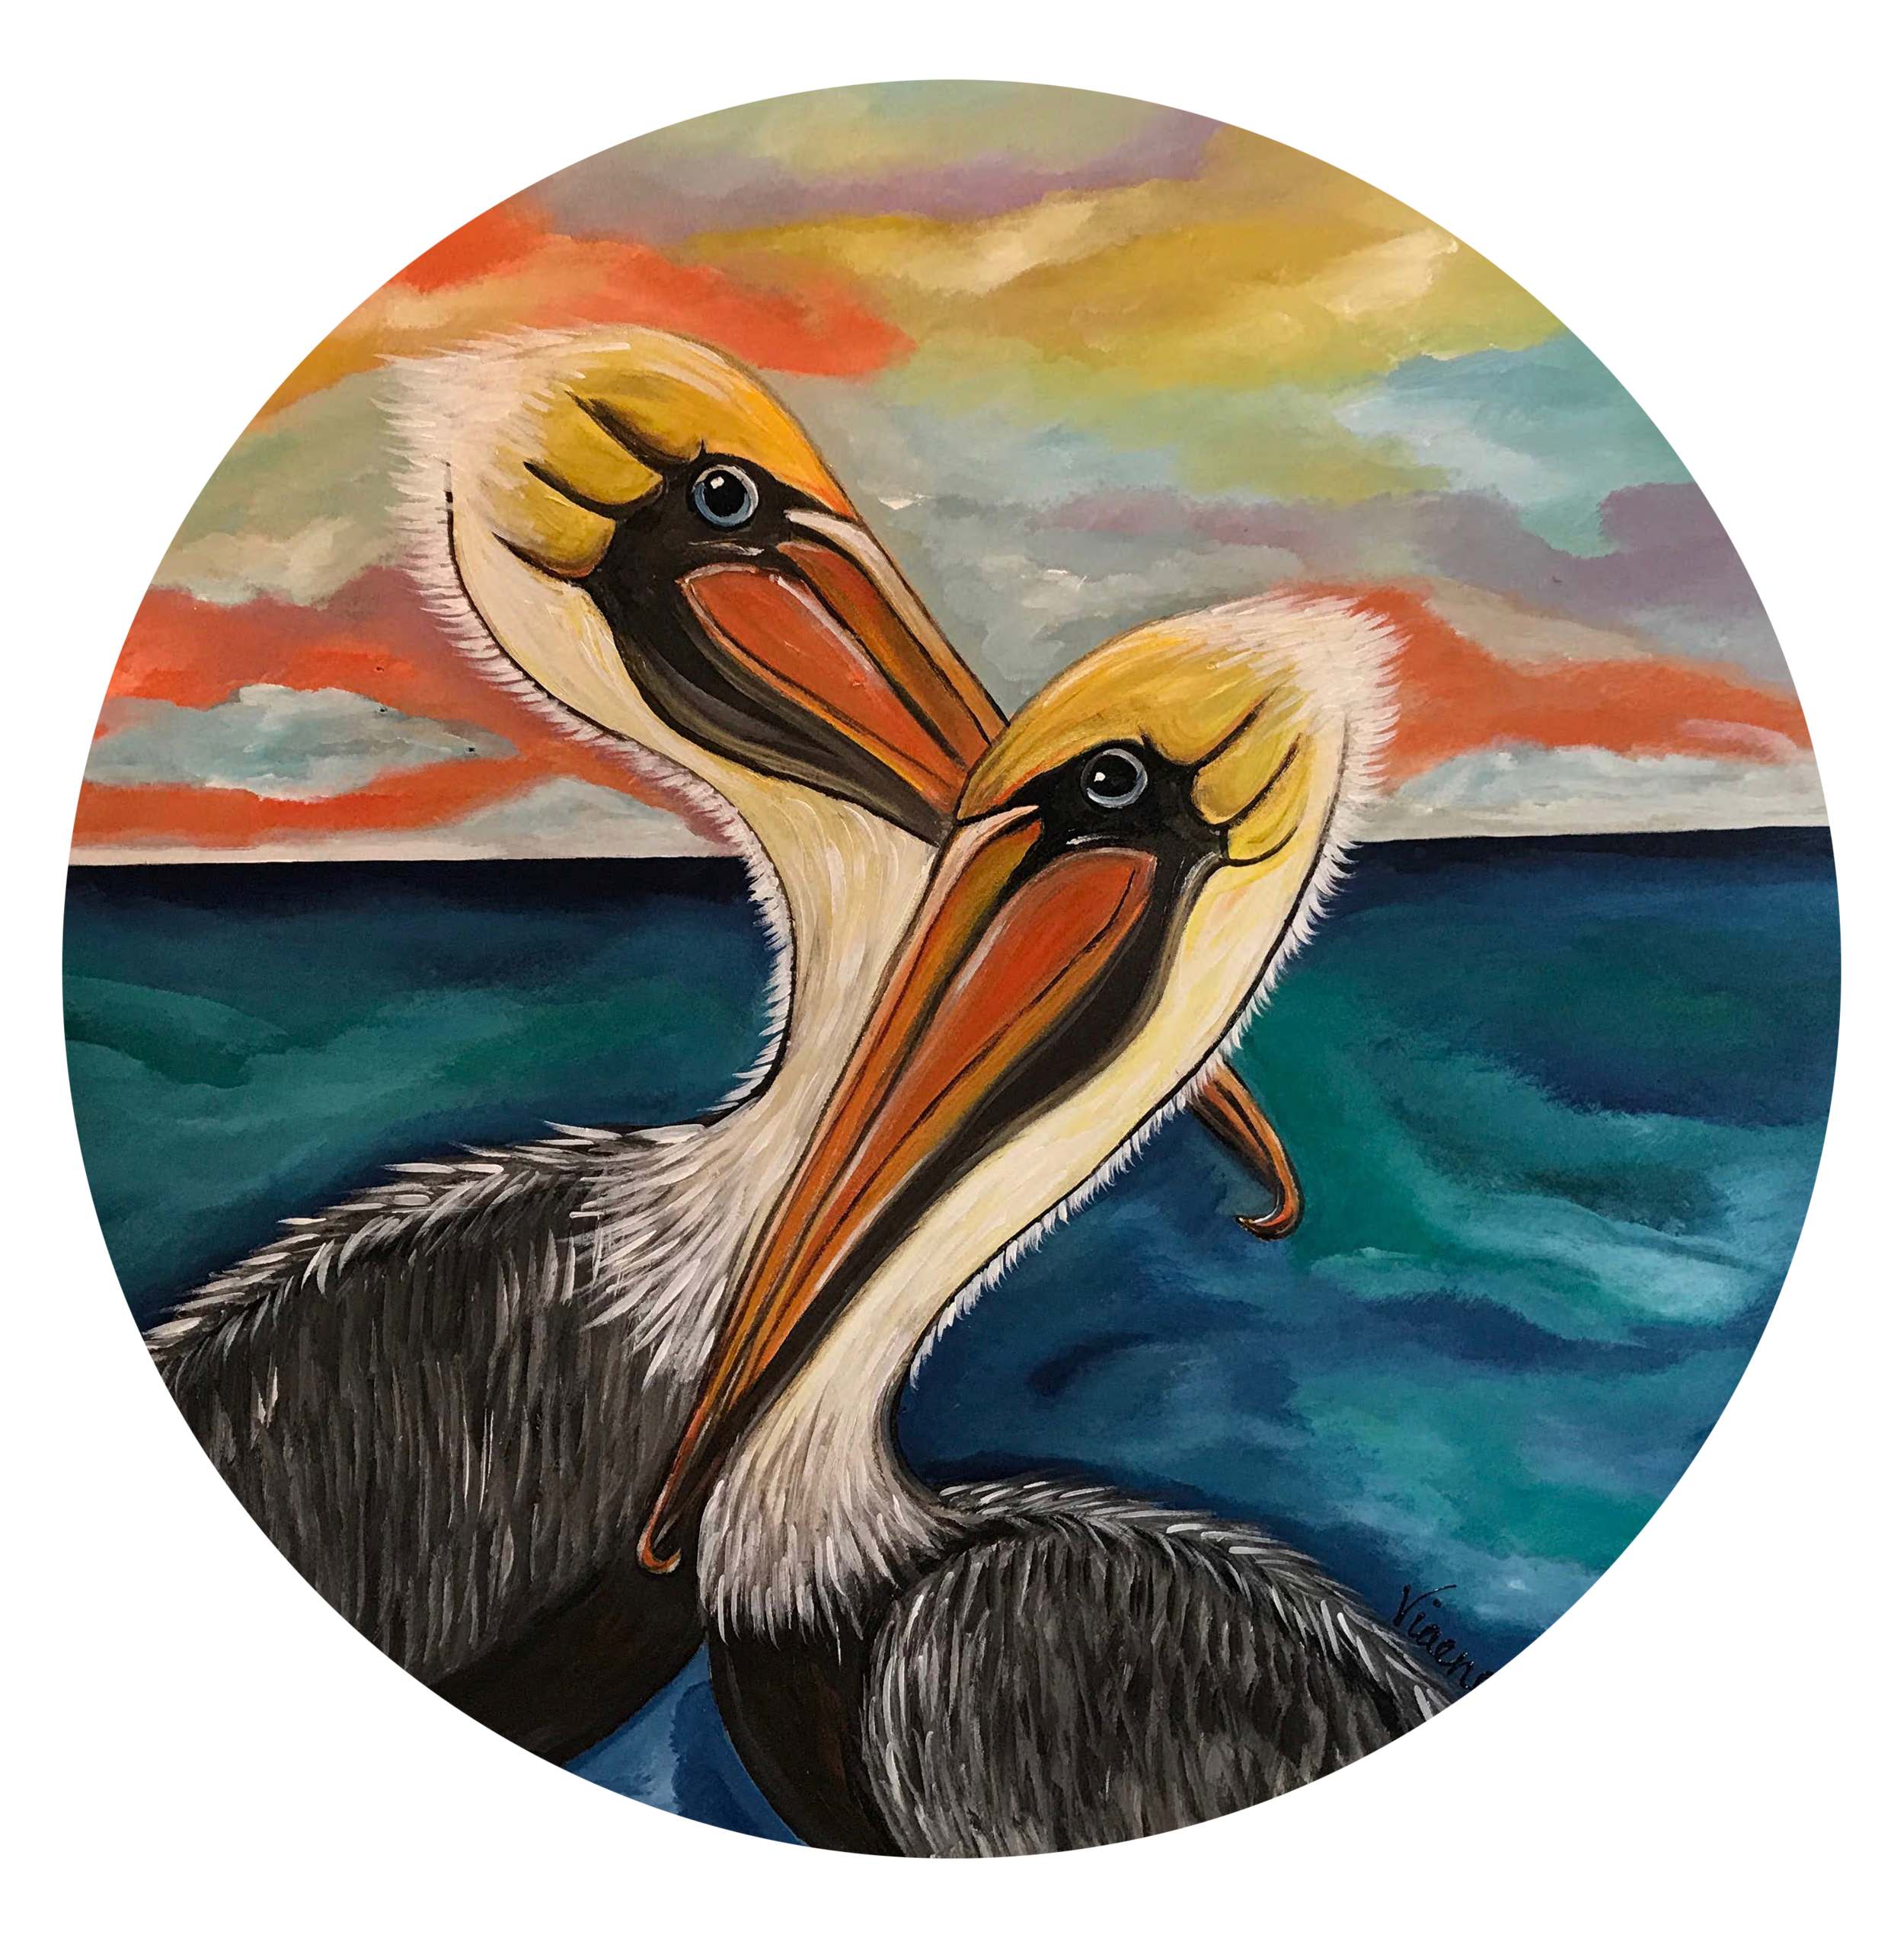 Sunset Pelicans - 201824 inch diameteracrylic on wood